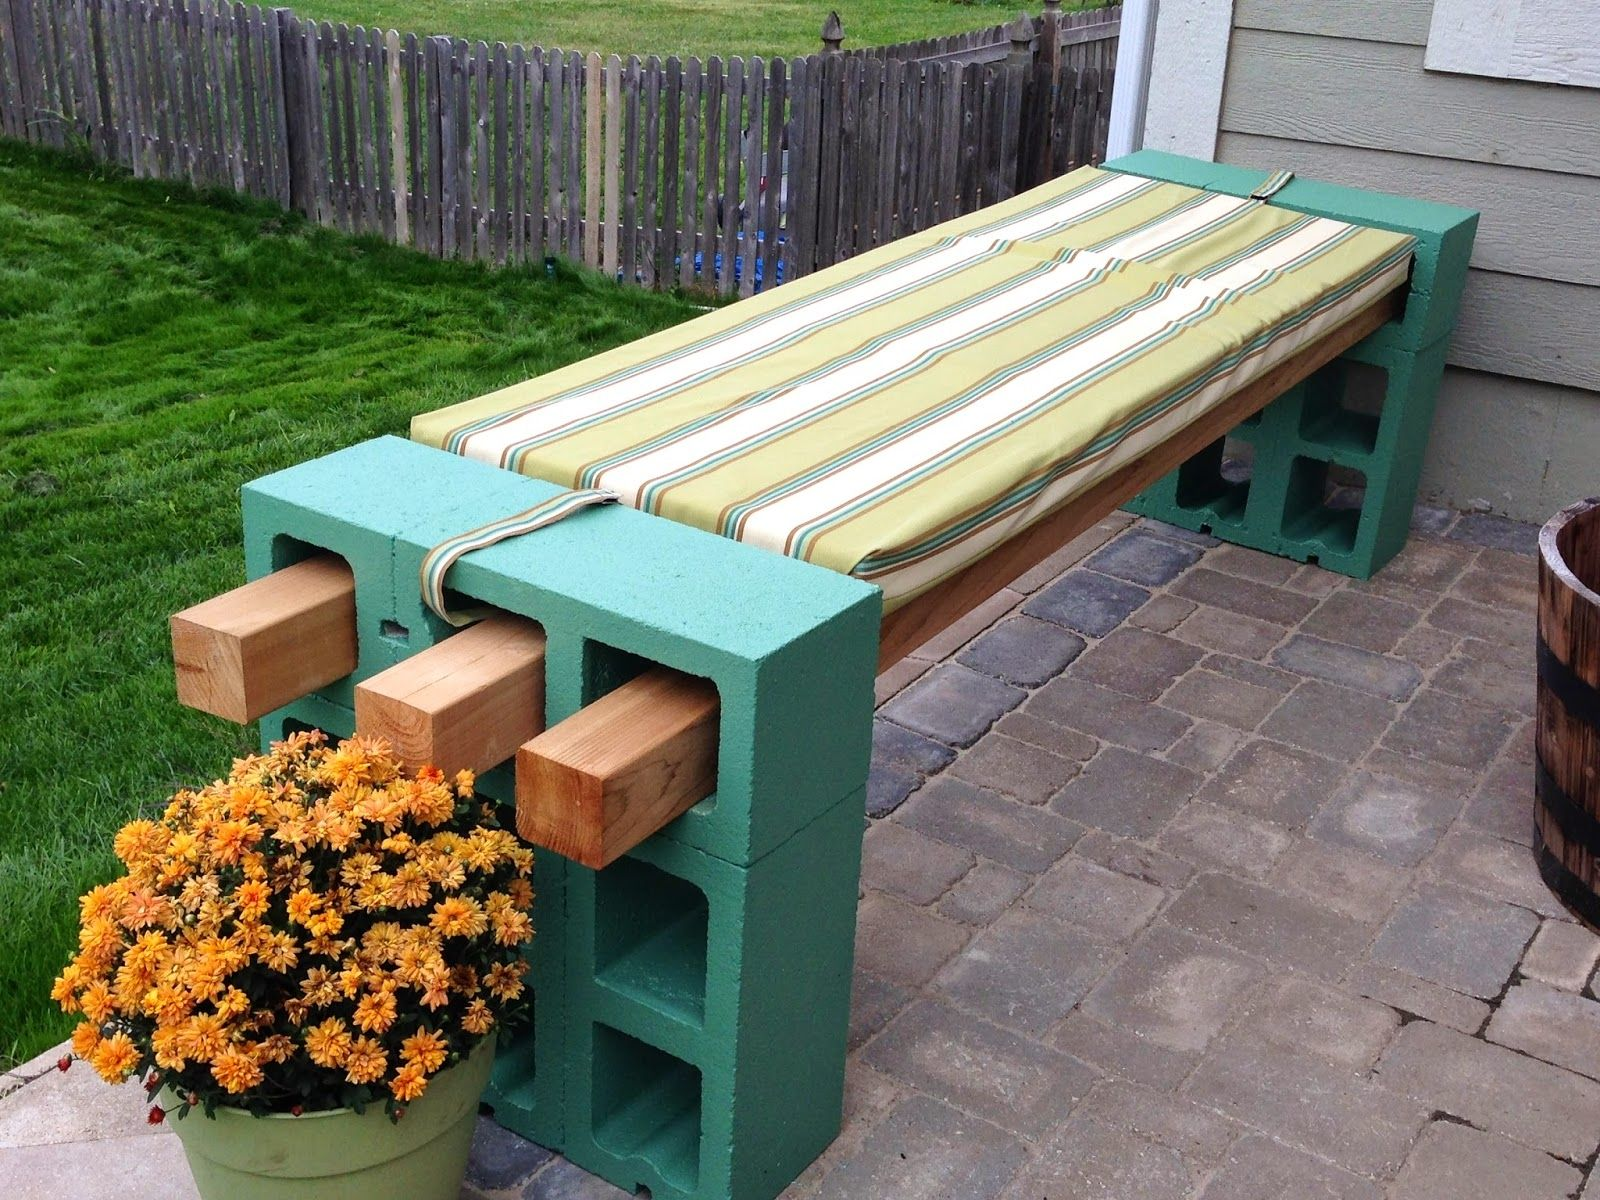 Image Result For Curved Cinder Block Bench Garden Bench Diy Easy Patio Furniture Diy Garden Furniture